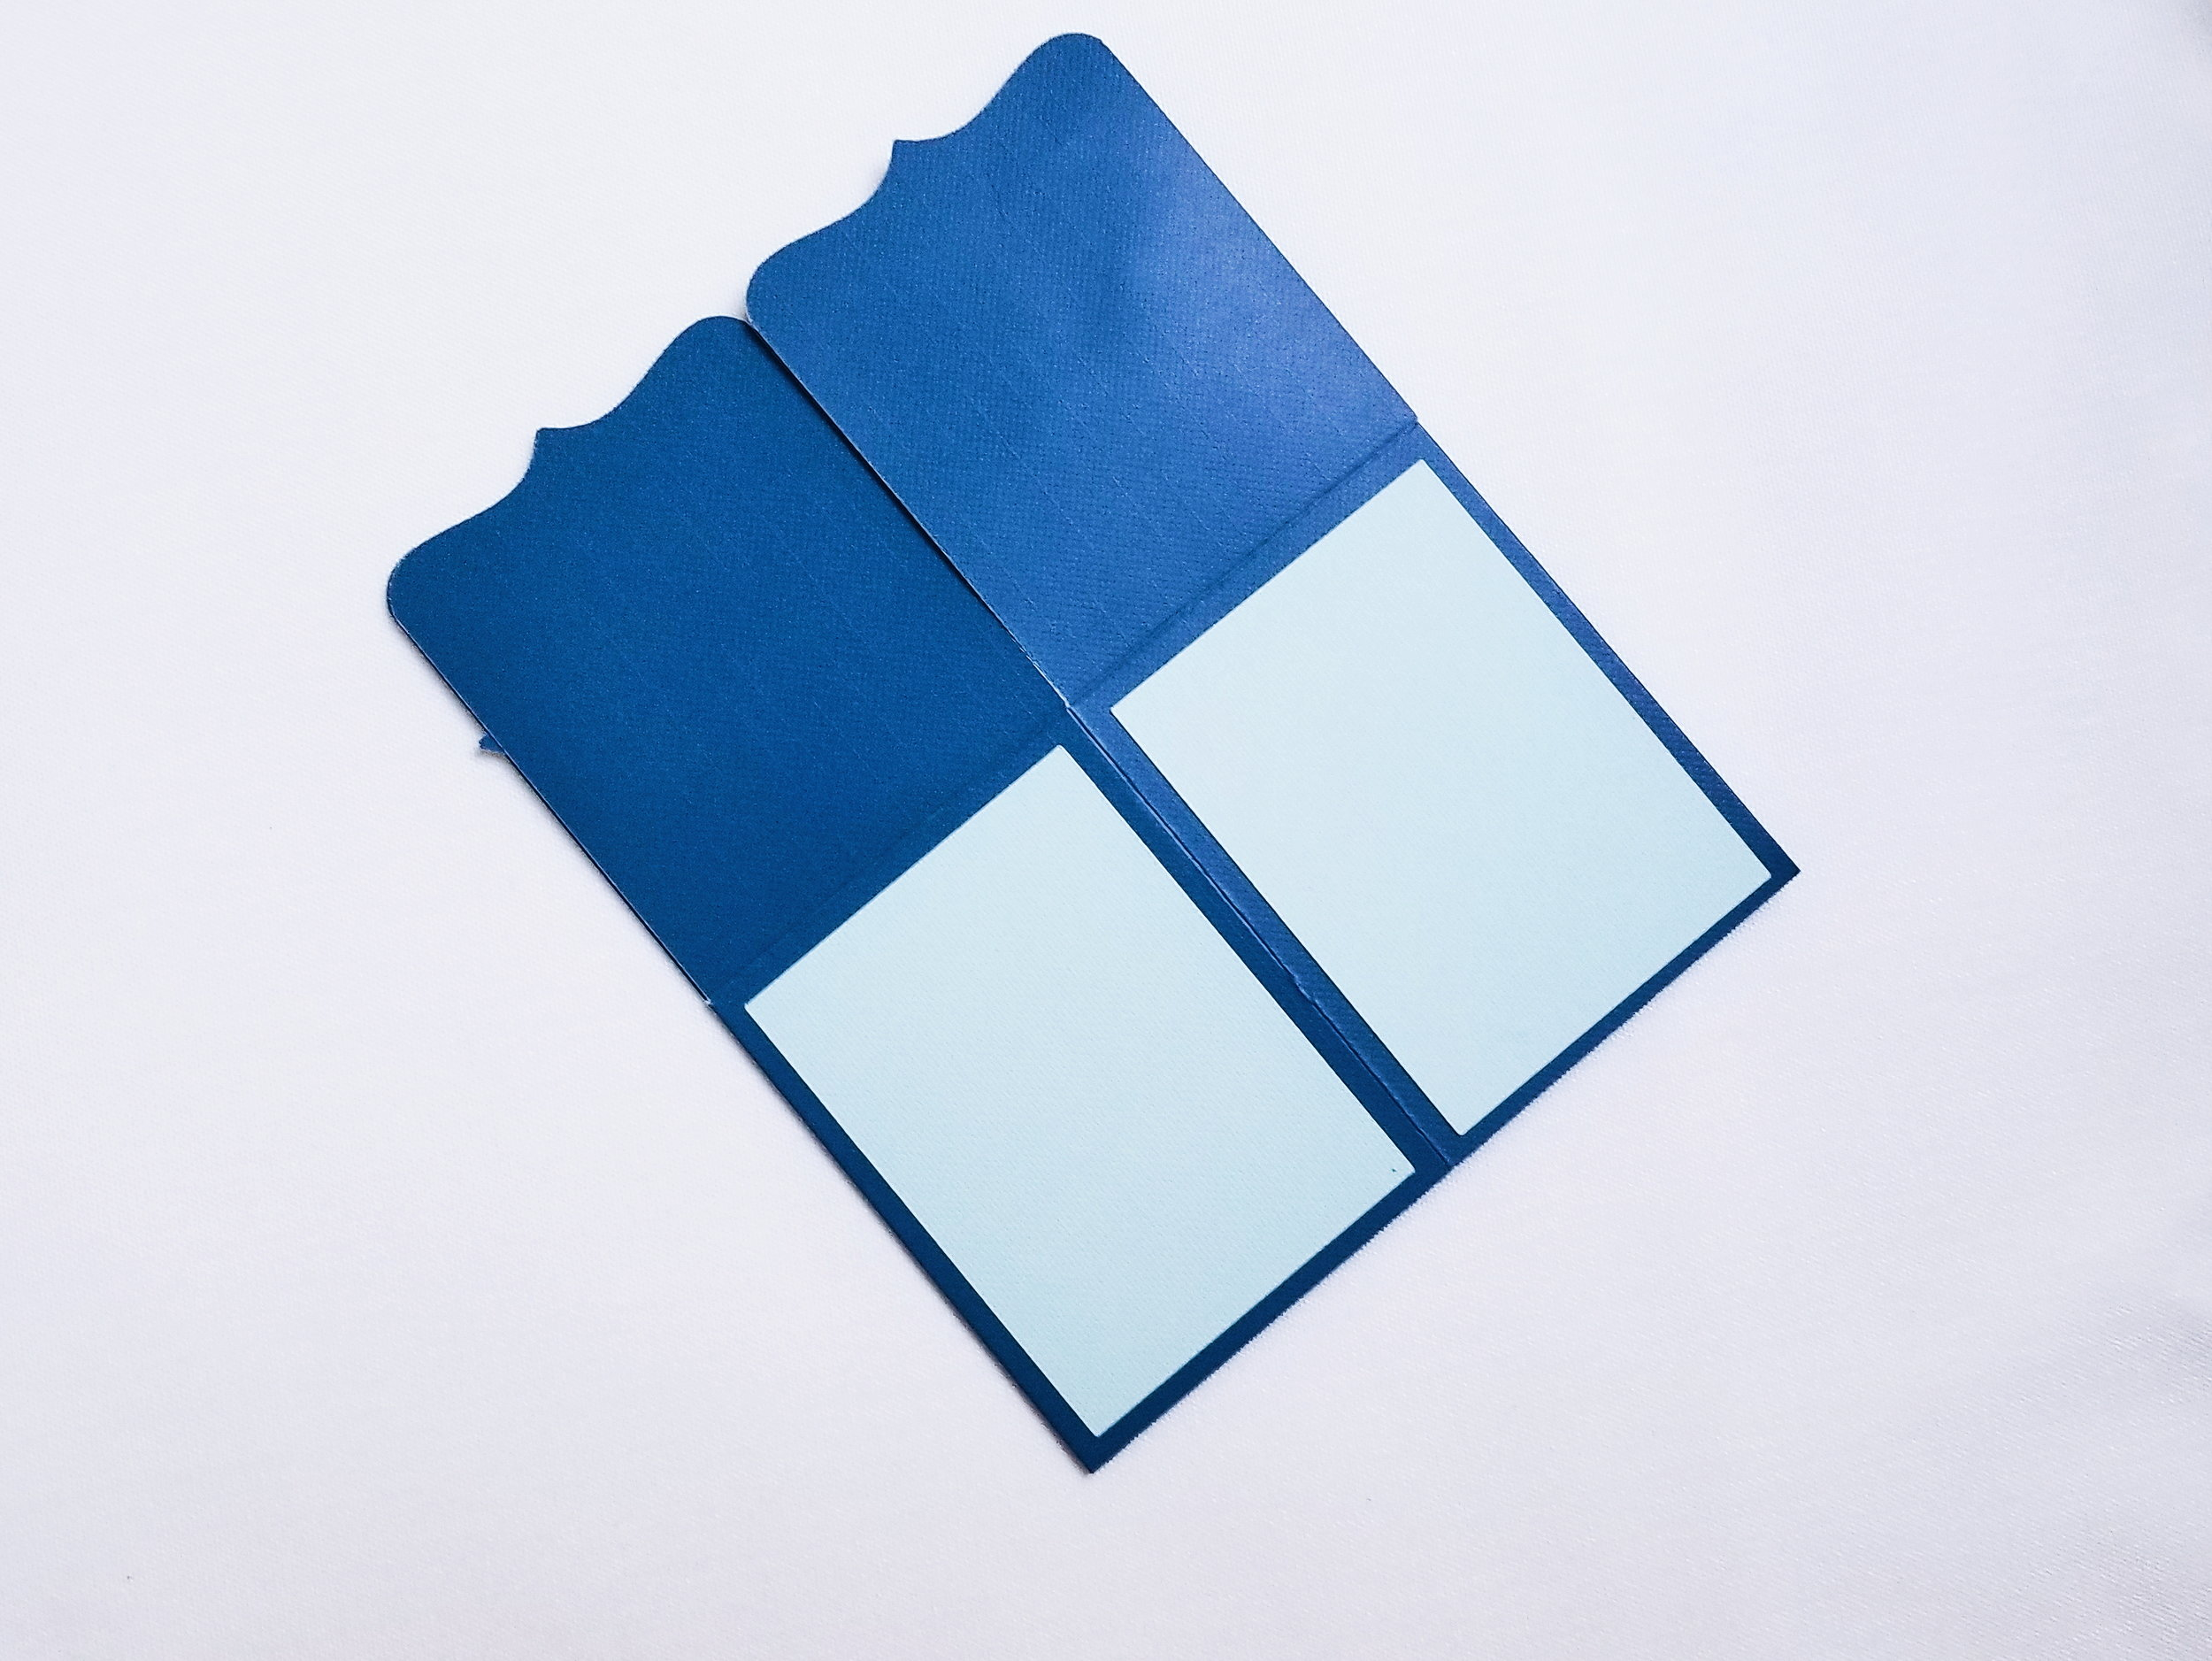 Card Folds Flat